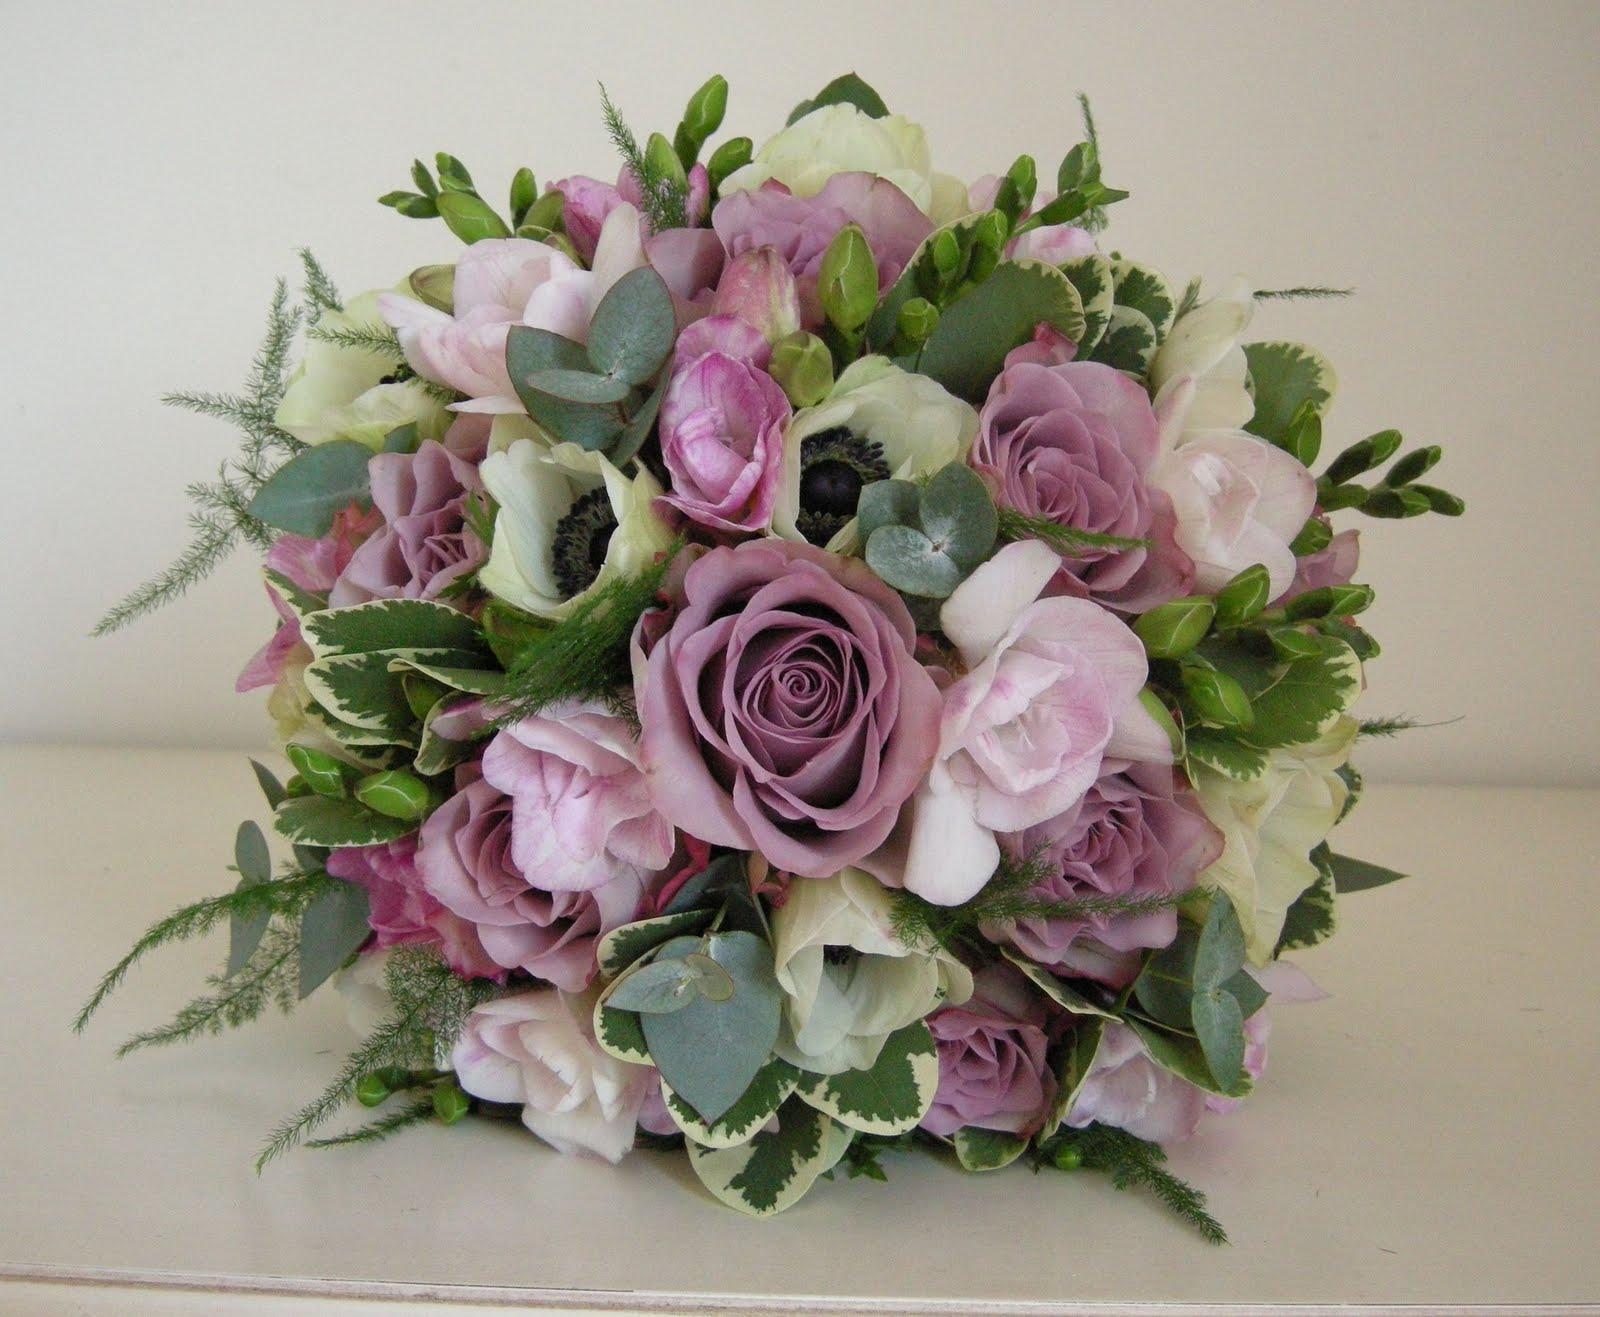 Wedding Flowers Blog: Selina's winter wedding flowers with ...